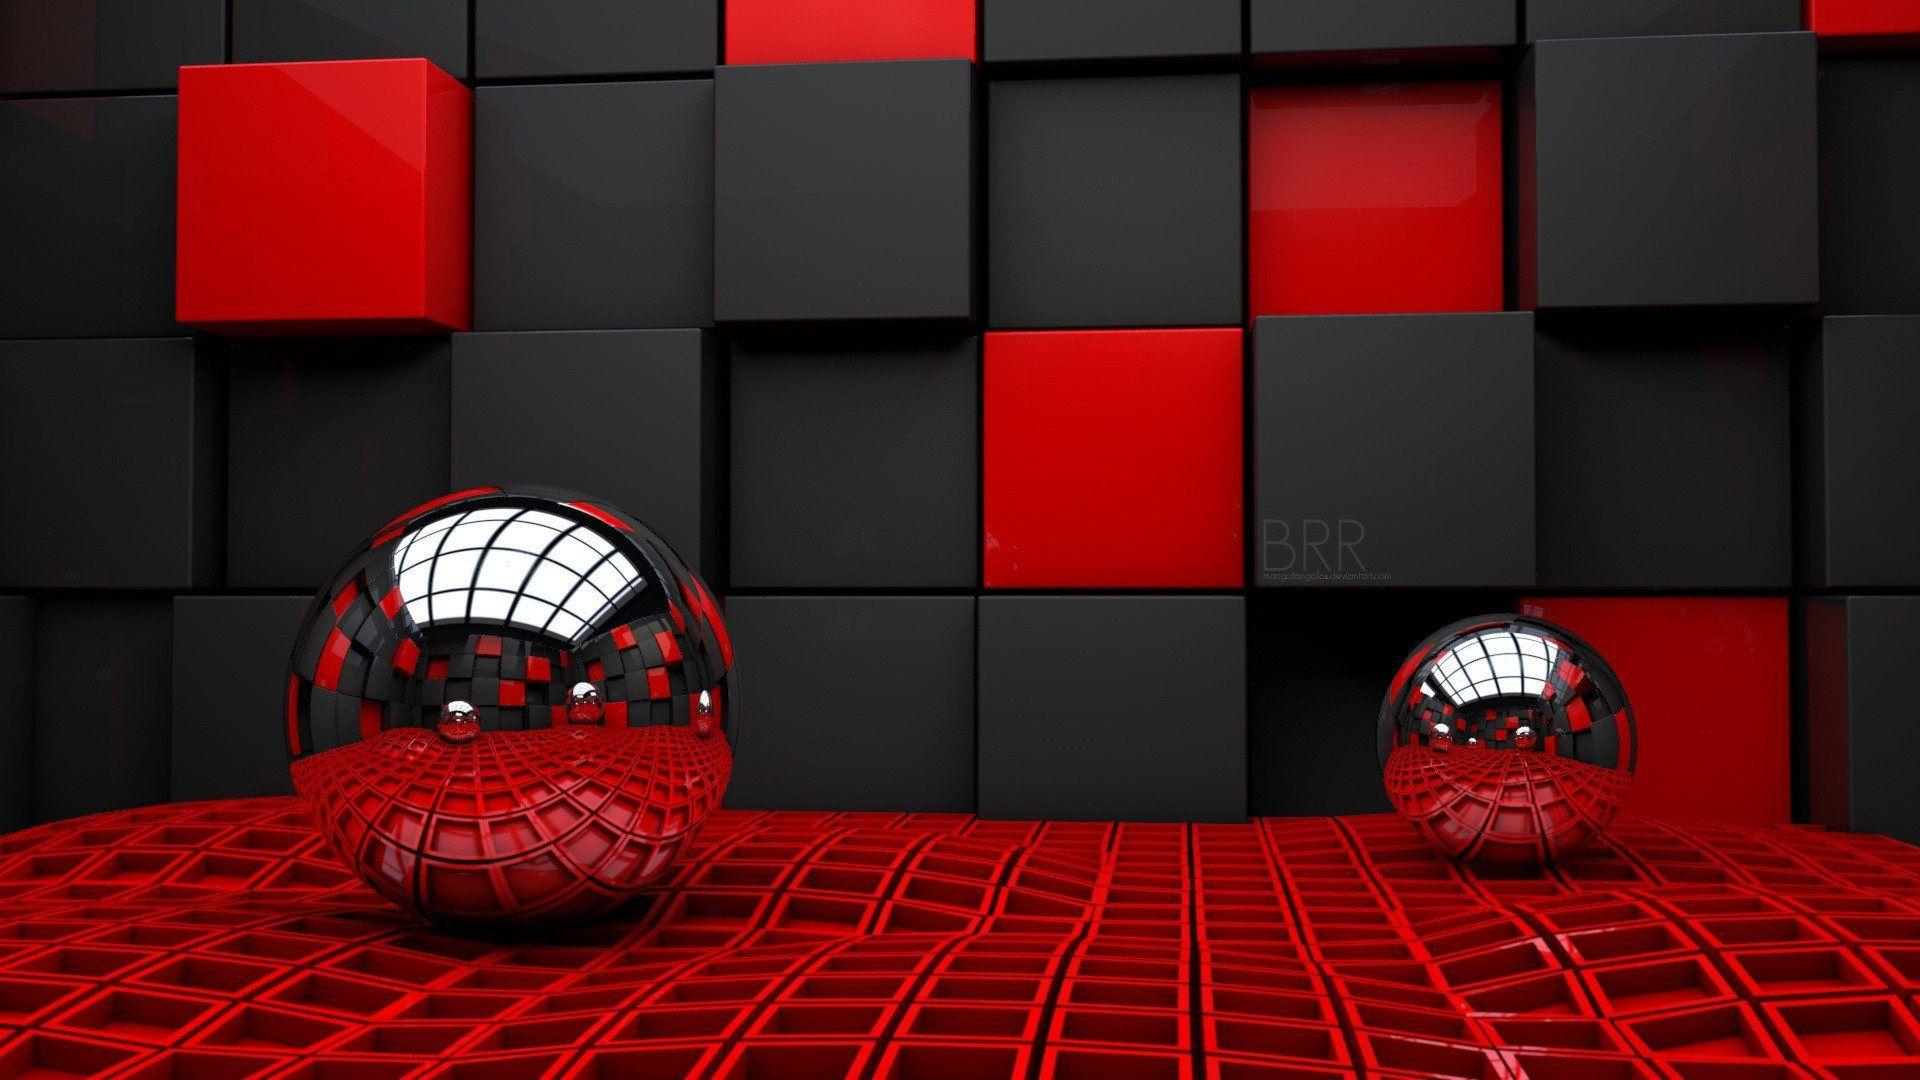 Beautiful 3d Wallpaper, 3 D Wallpaper With A Red Balloon